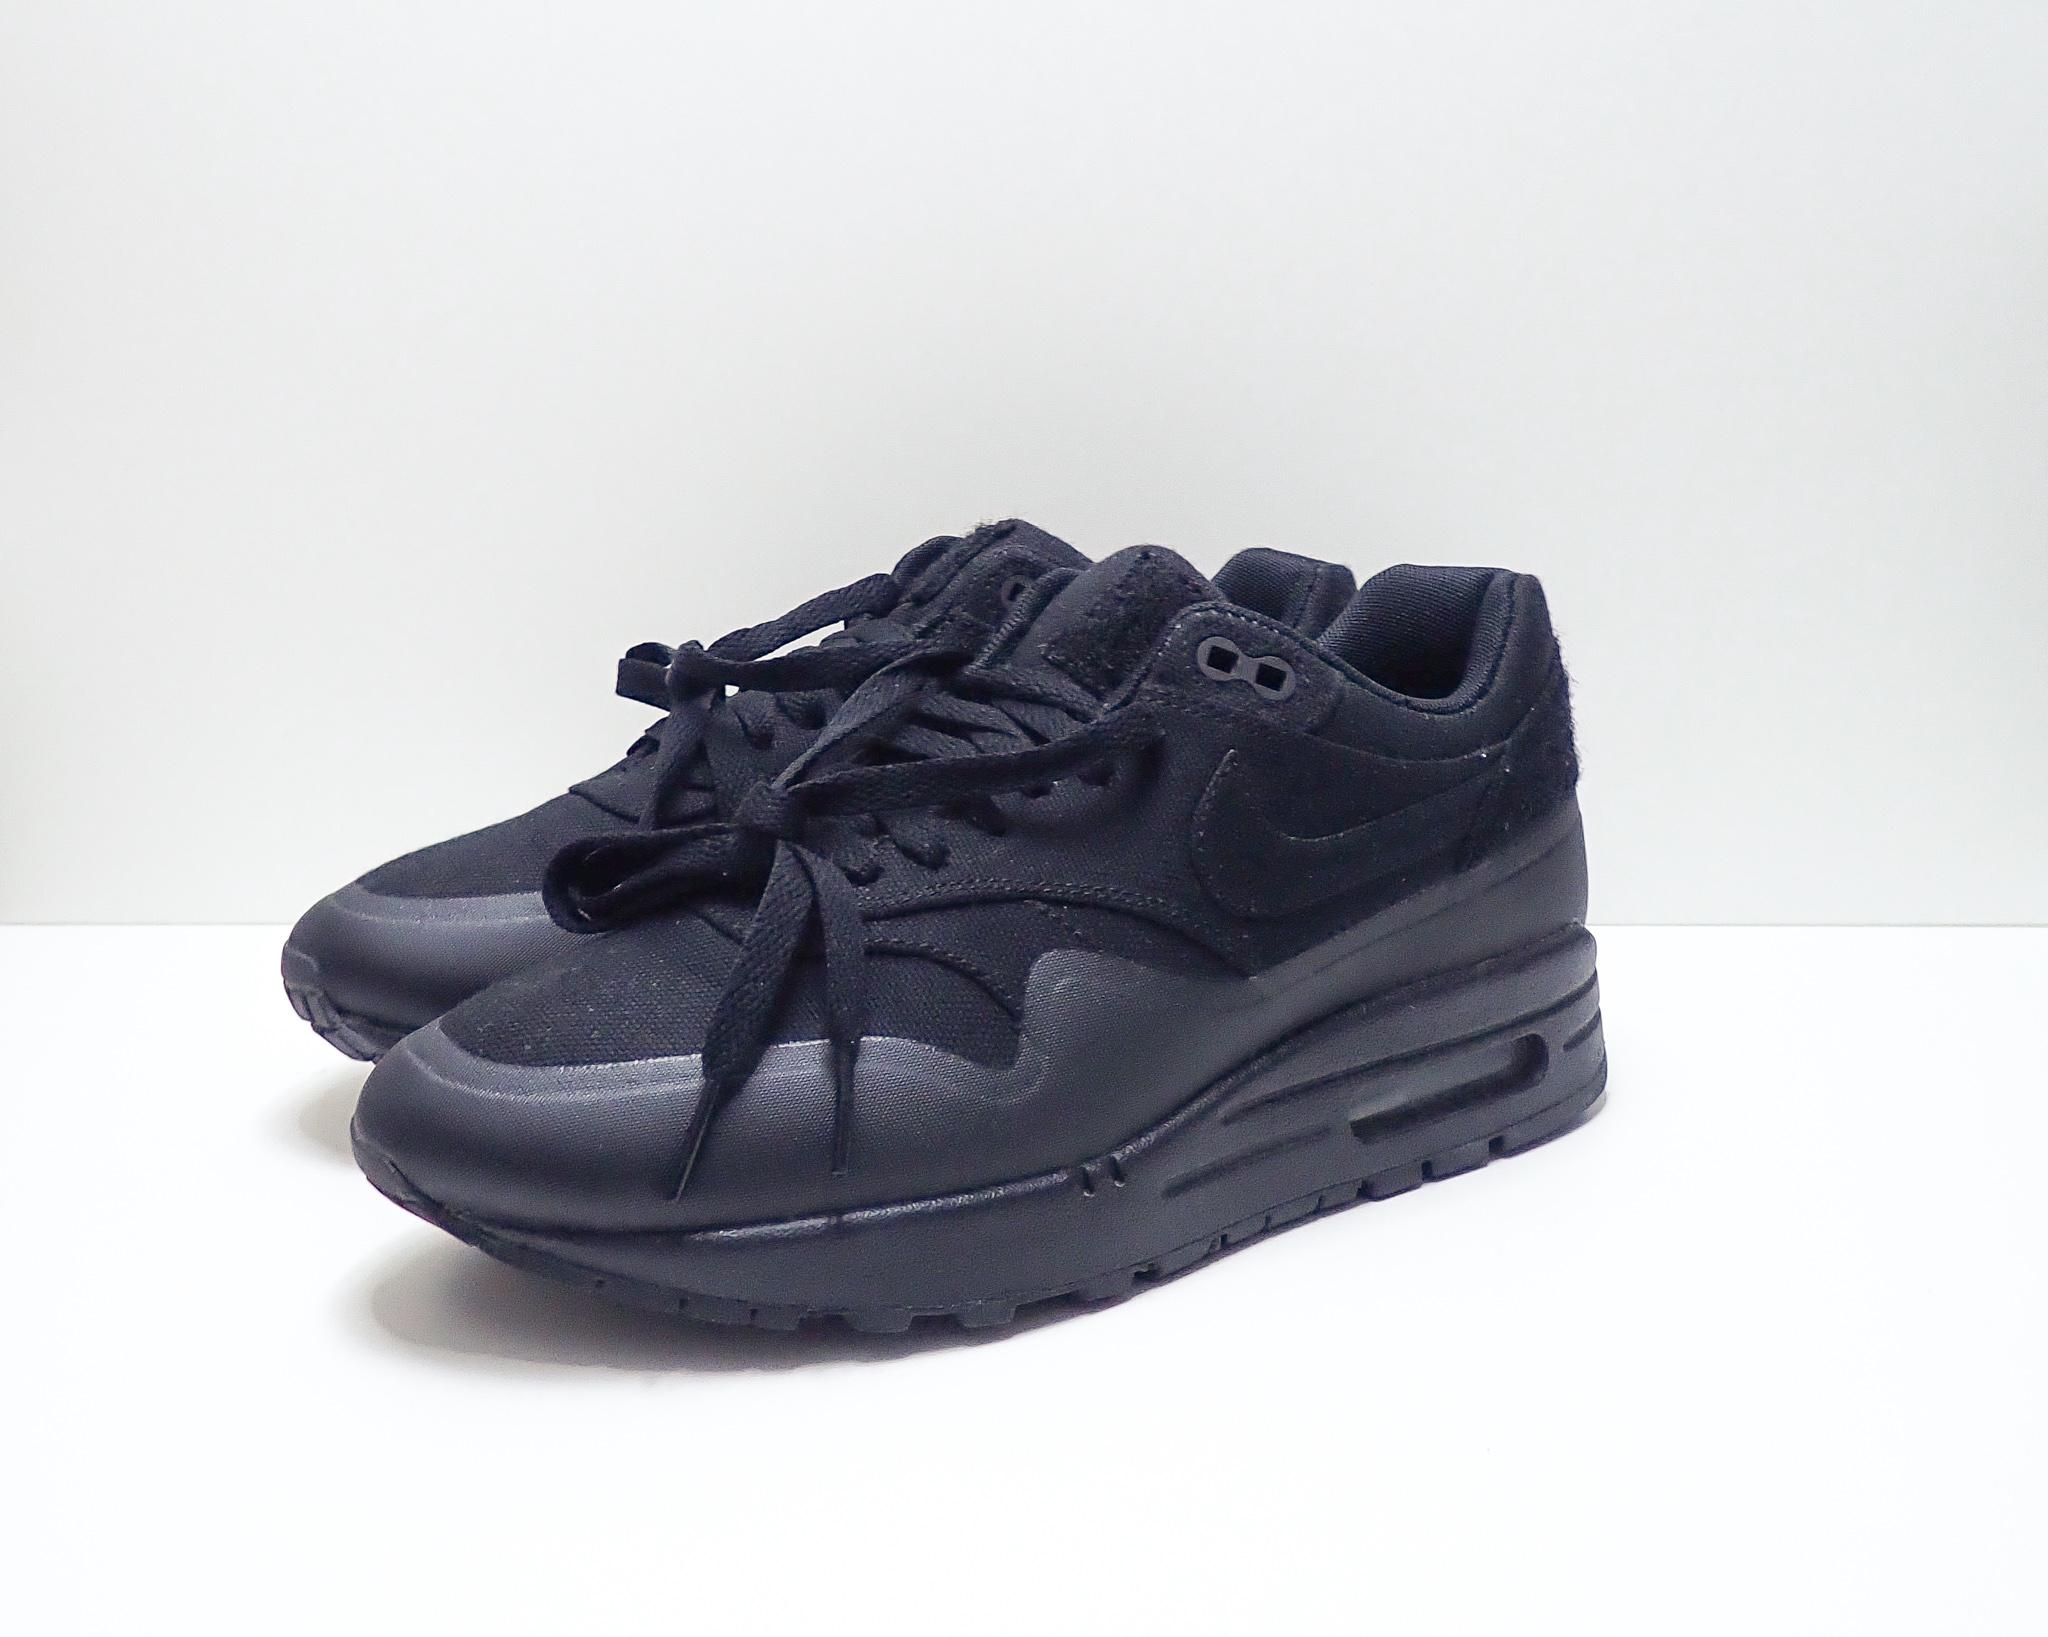 Nike Air Max 1 V SP Patch Black